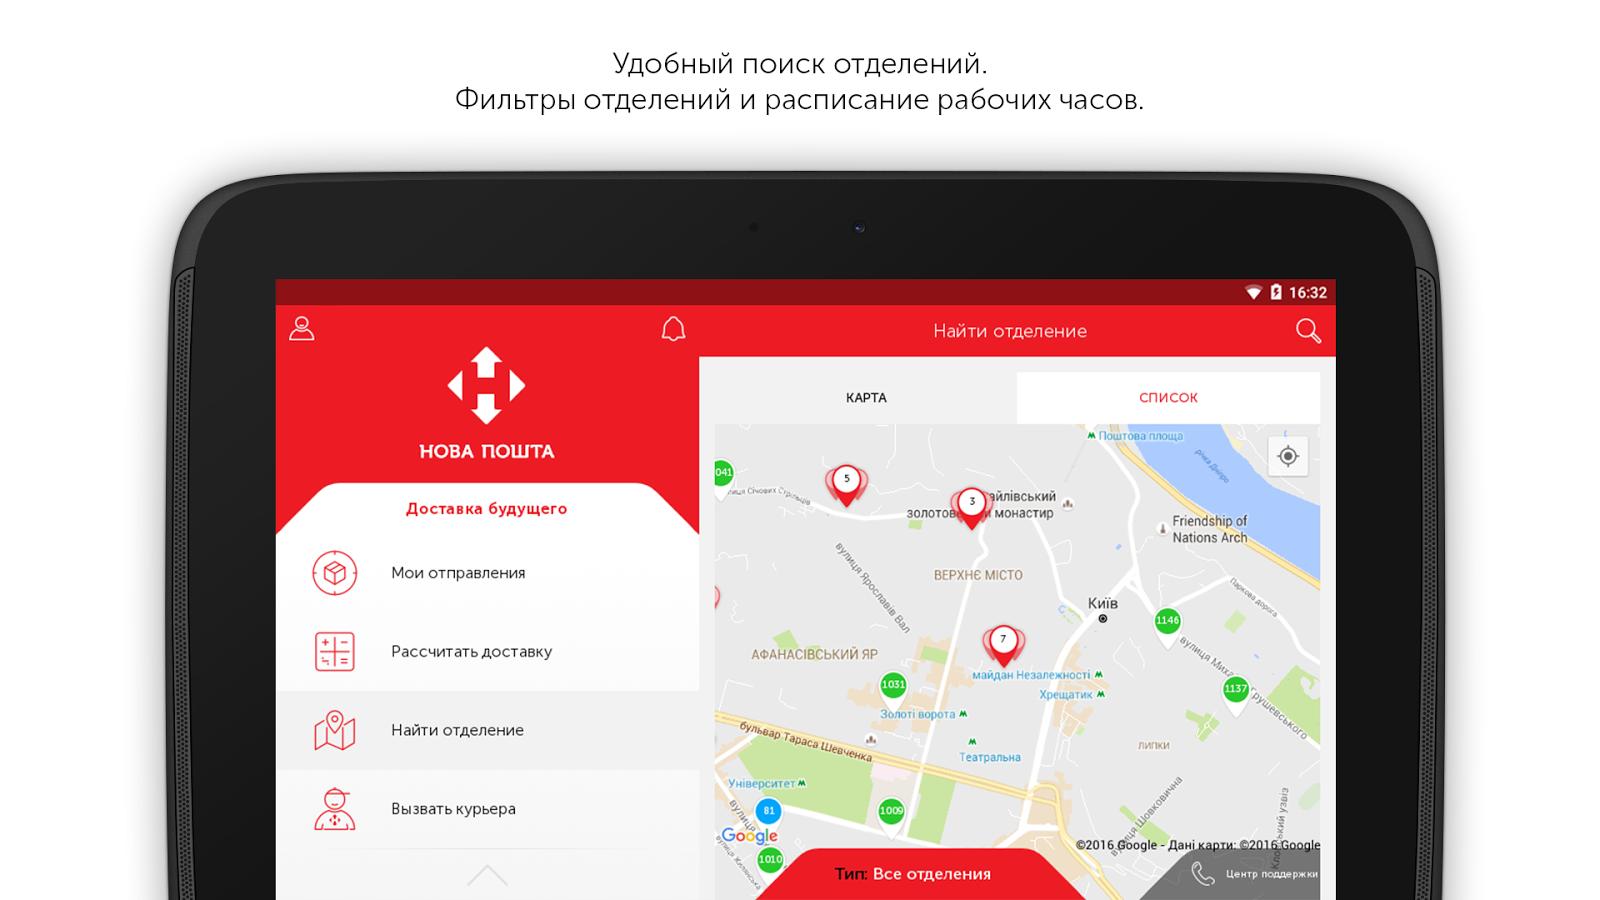 Screenshots of Nova Poshta for iPhone